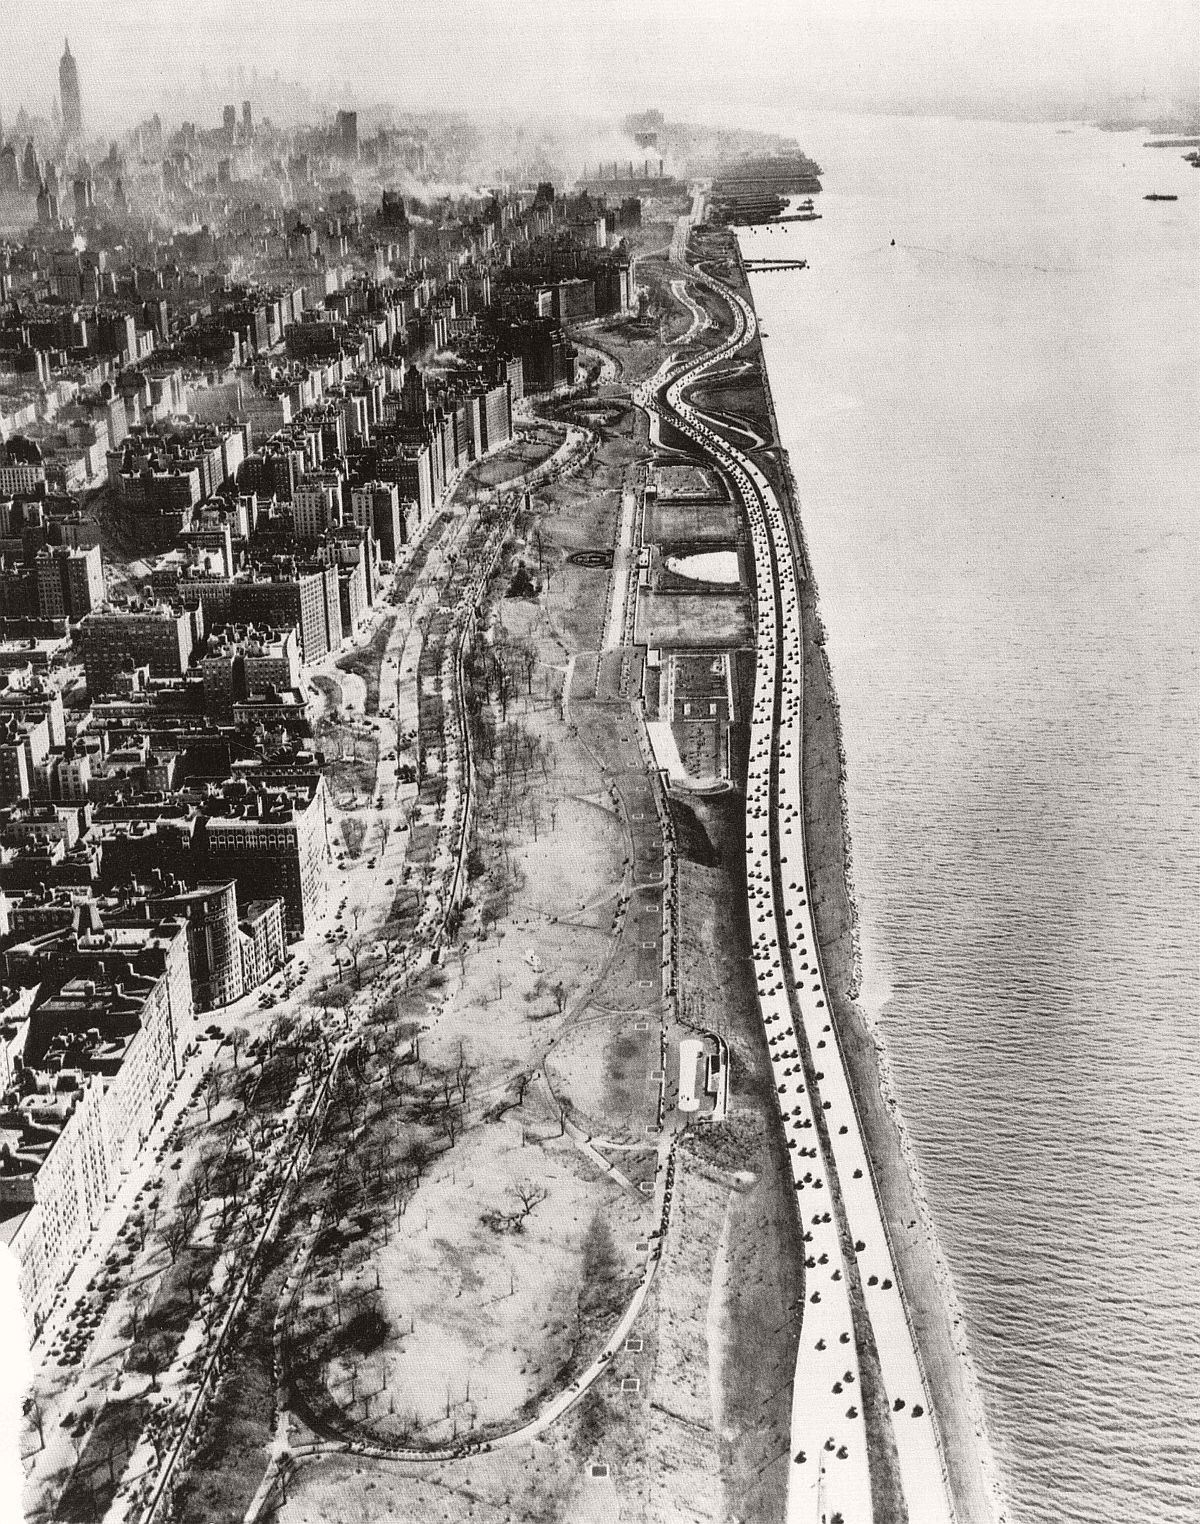 vintage-historic-new-york-city-black-white-in-1937-07